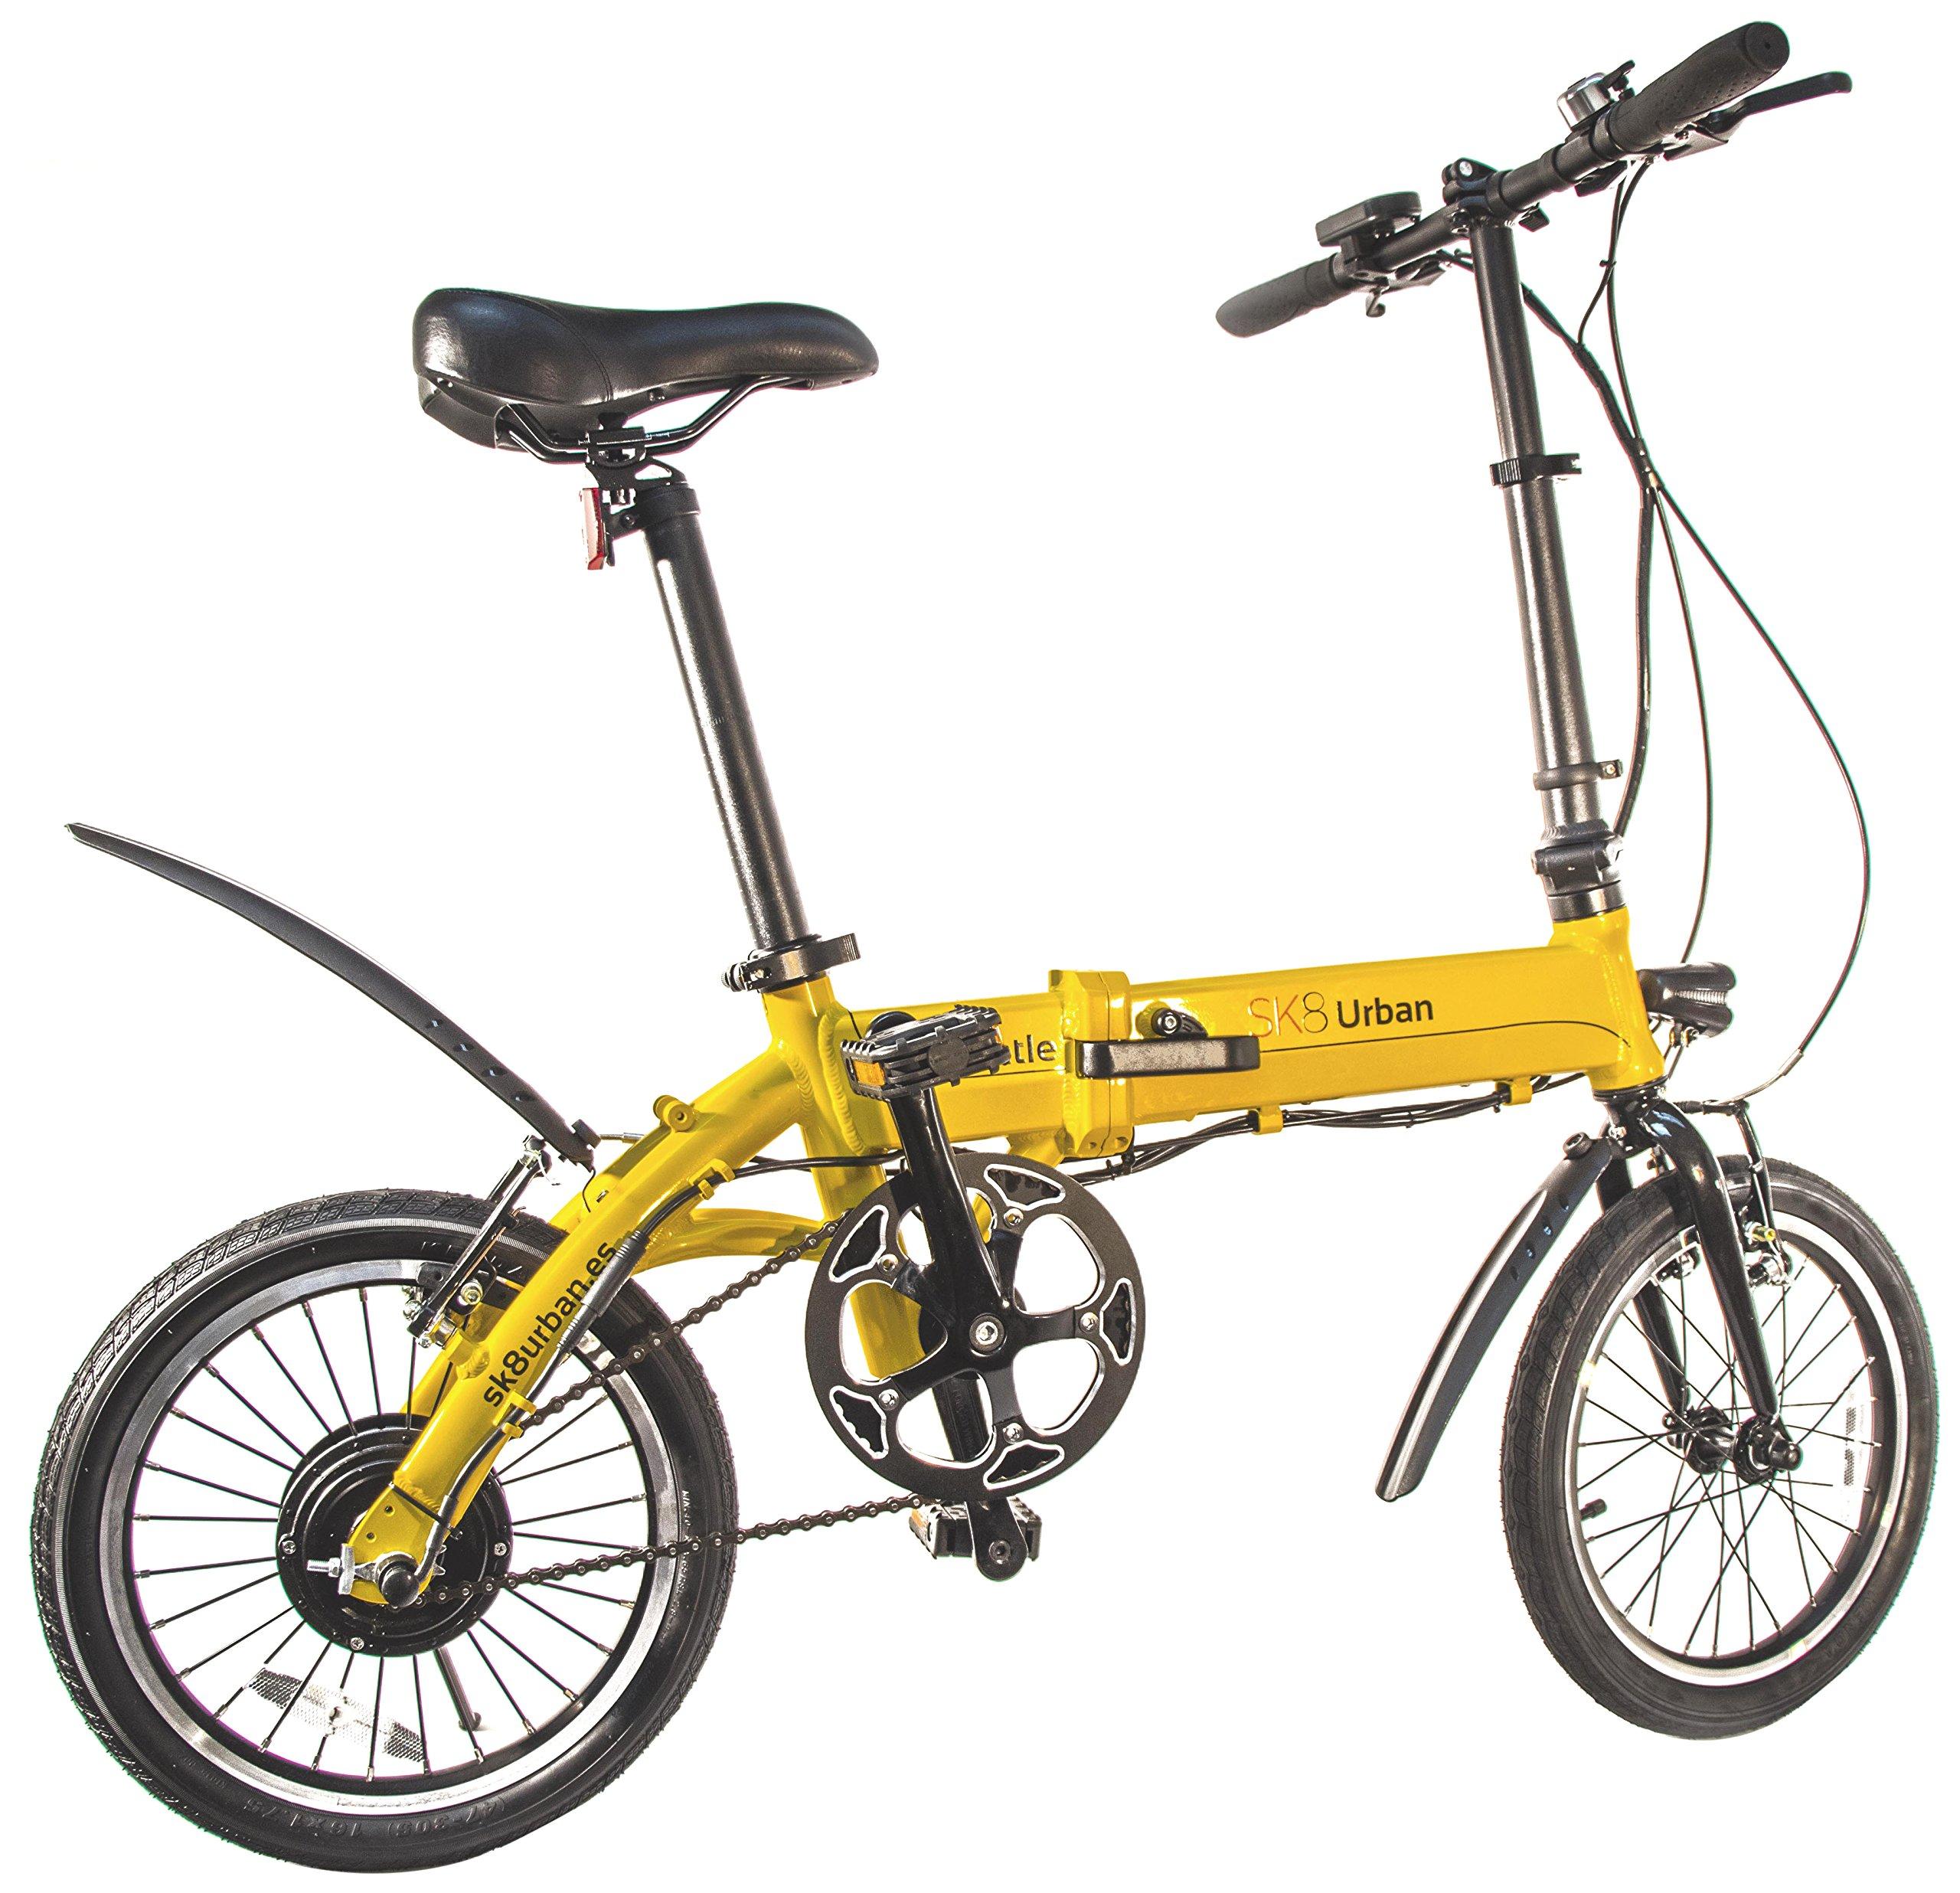 SK8 eBike Urban Beetle Bicicleta eléctrica plegable, Amarillo product image